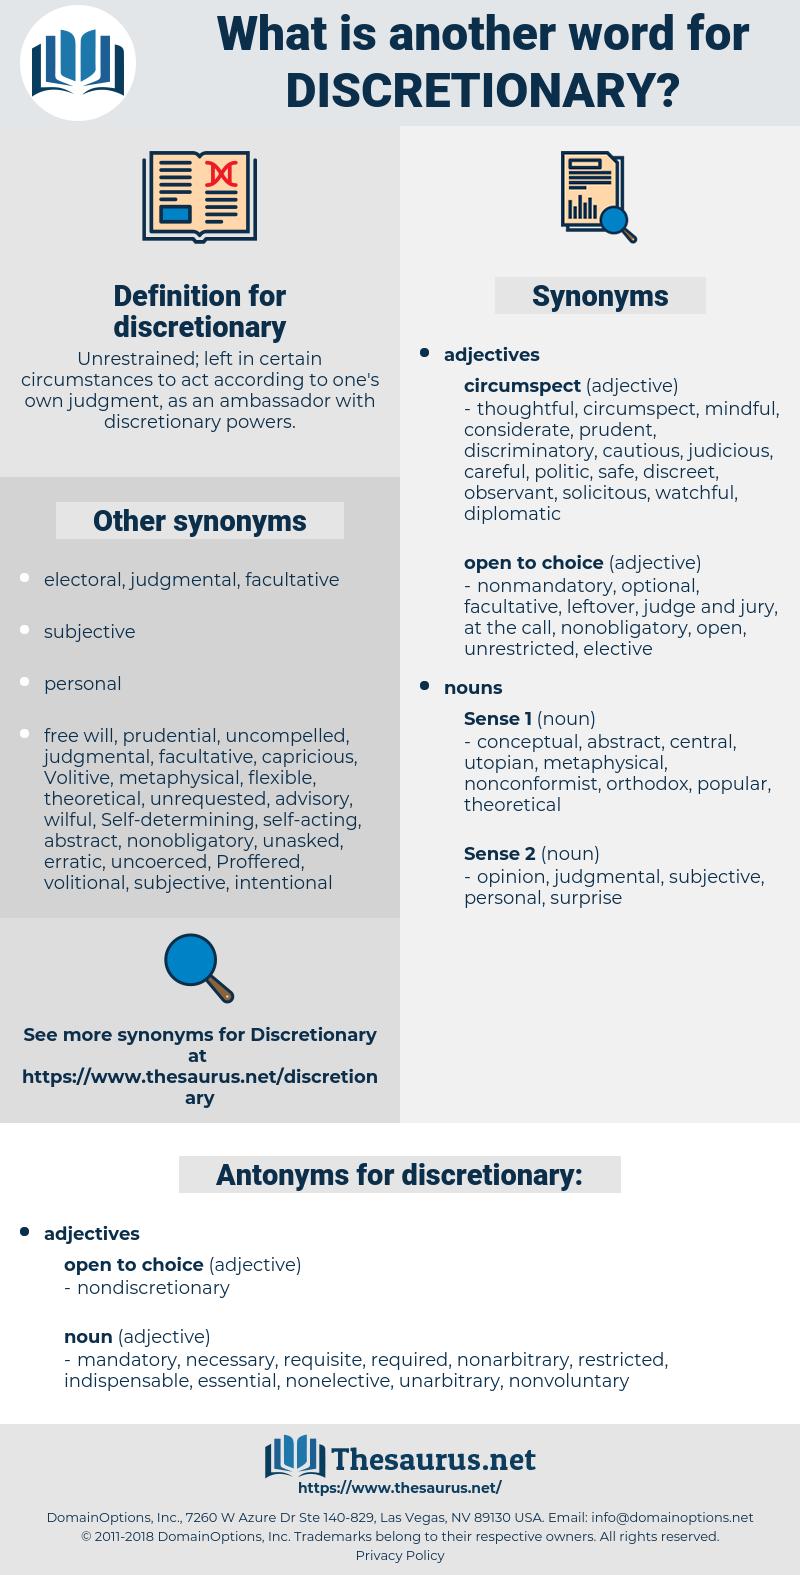 discretionary, synonym discretionary, another word for discretionary, words like discretionary, thesaurus discretionary